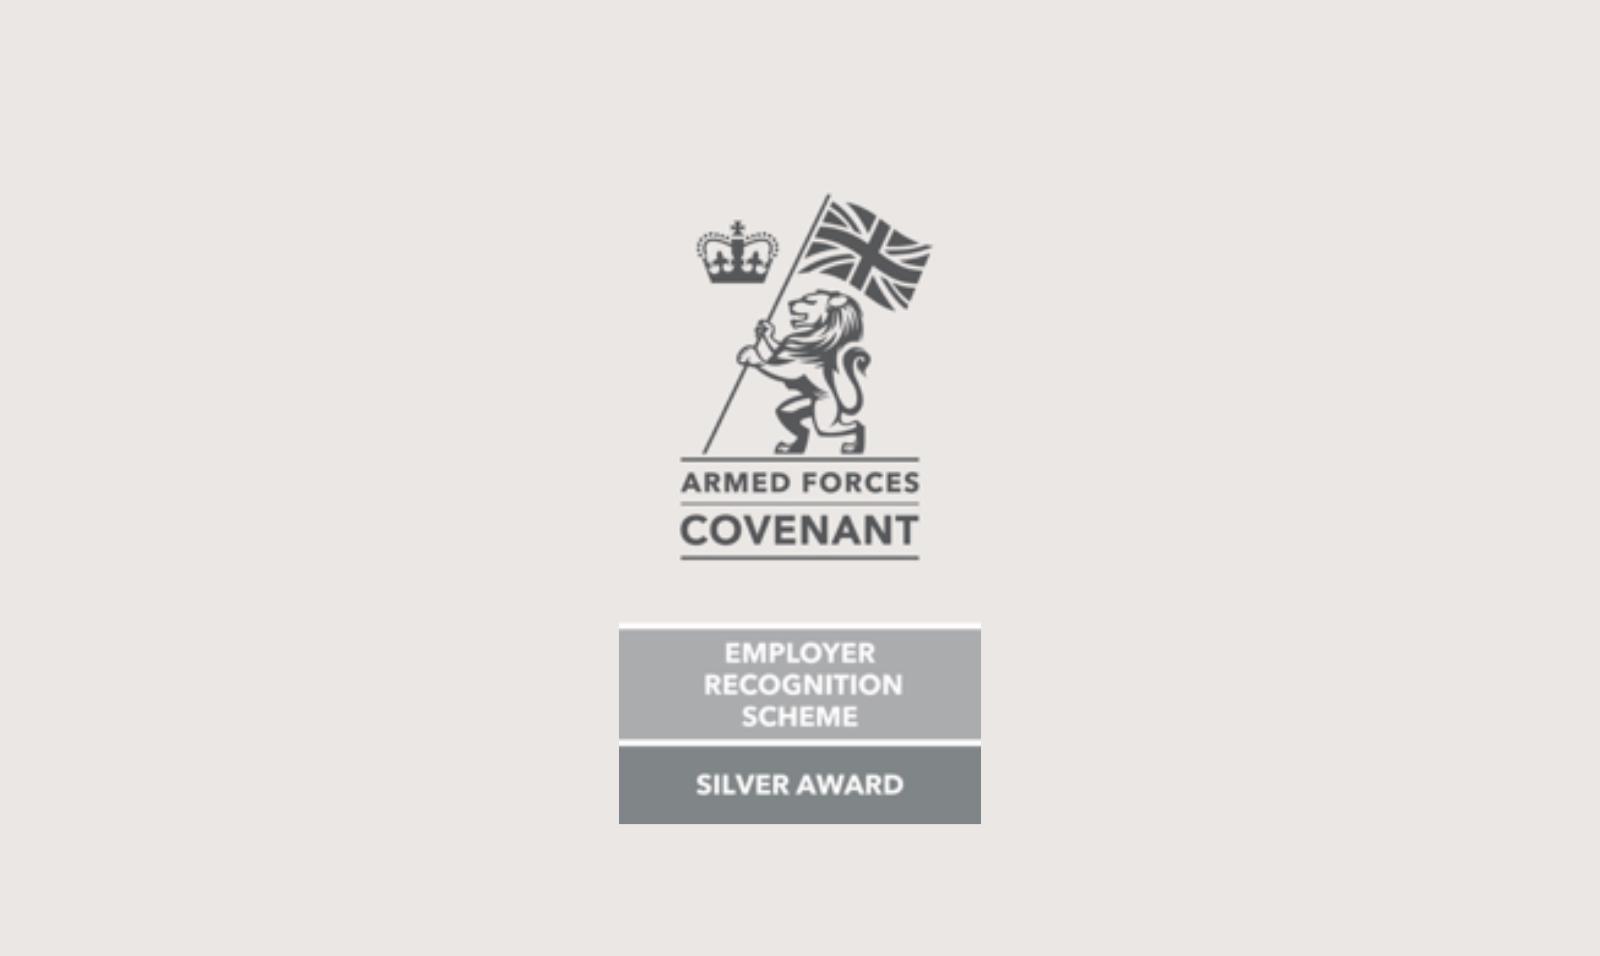 2019 Employer Recognition Scheme Silver Awards